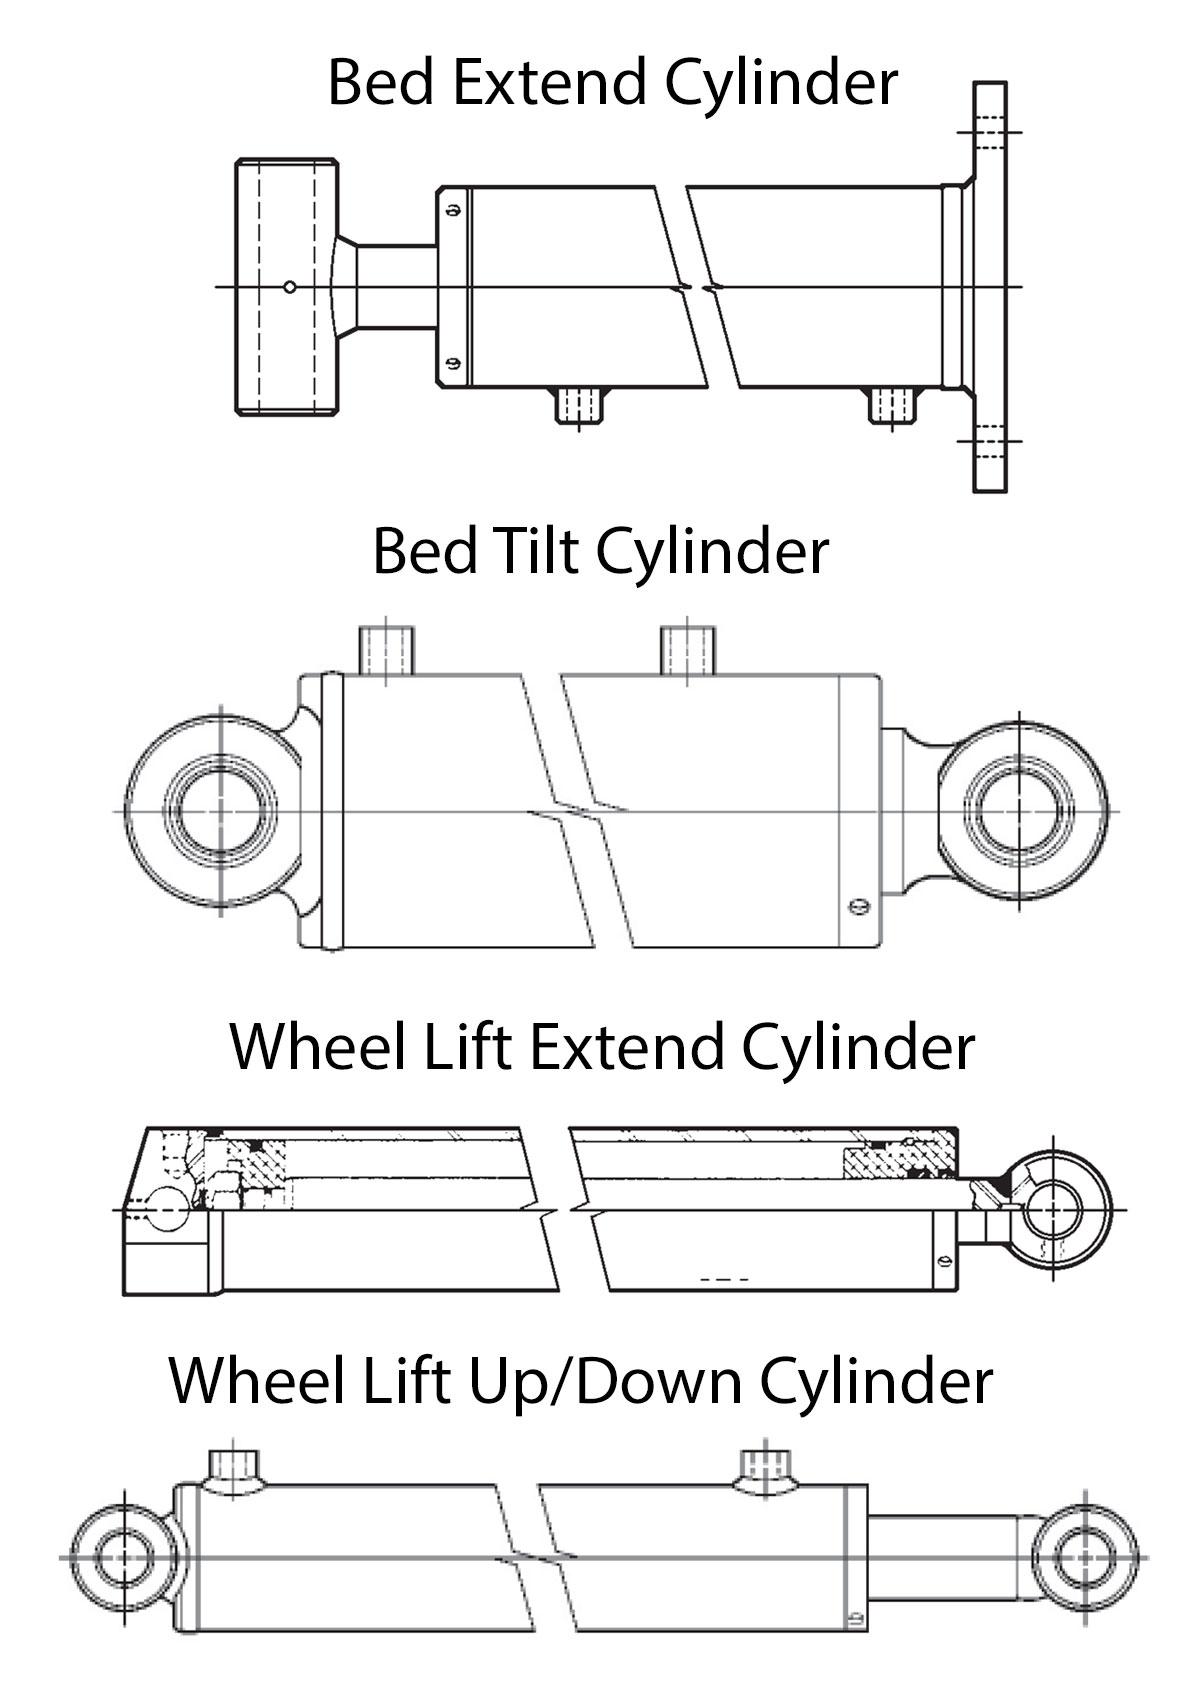 car lift hydraulic schematics wiring library hydraulic hybrid vehicles car lift hydraulic schematics